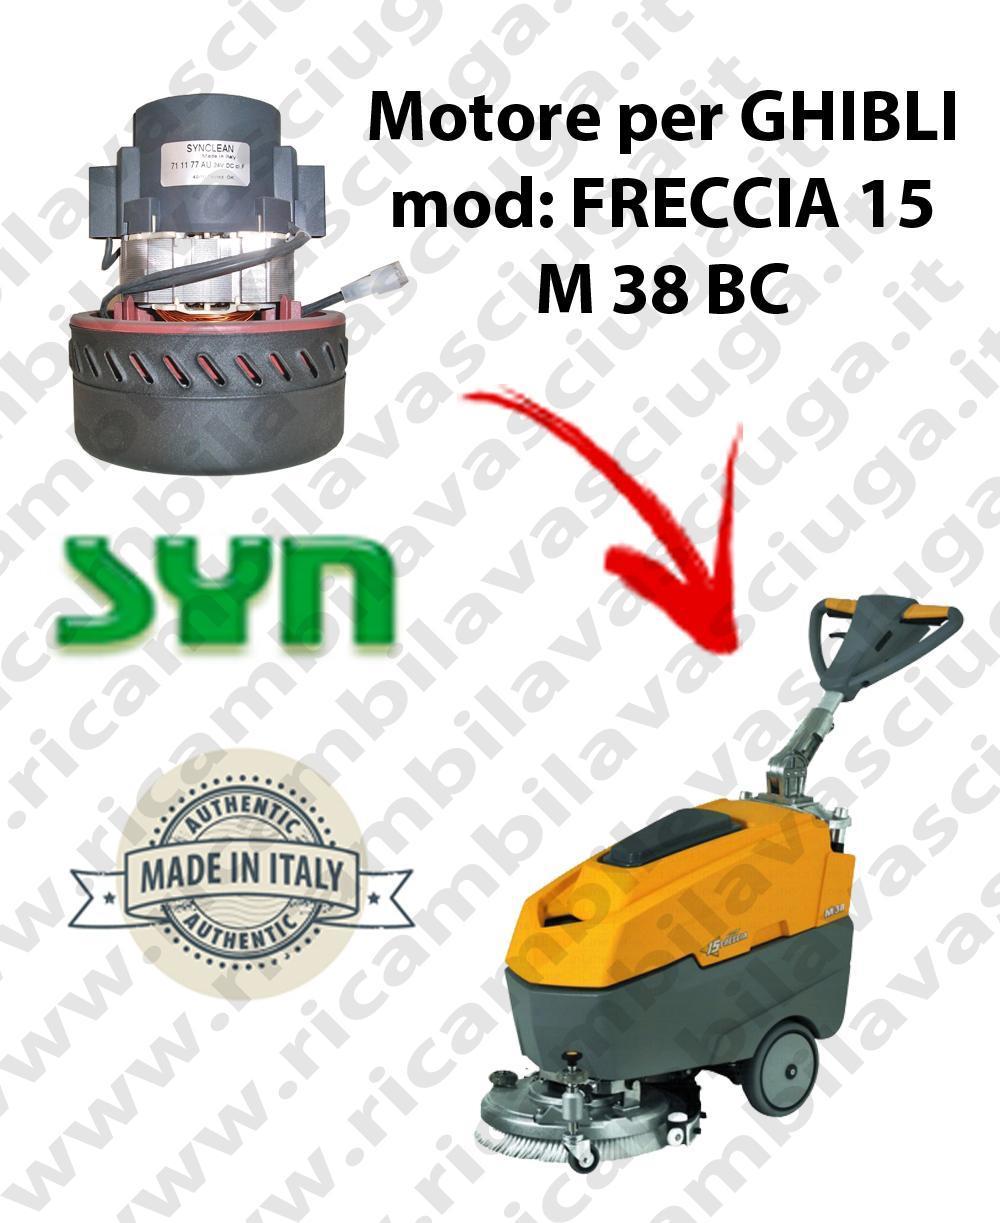 FRECCIA 15 M 38 BC Vacuum motor SY NCLEAN for scrubber dryer GHIBLI